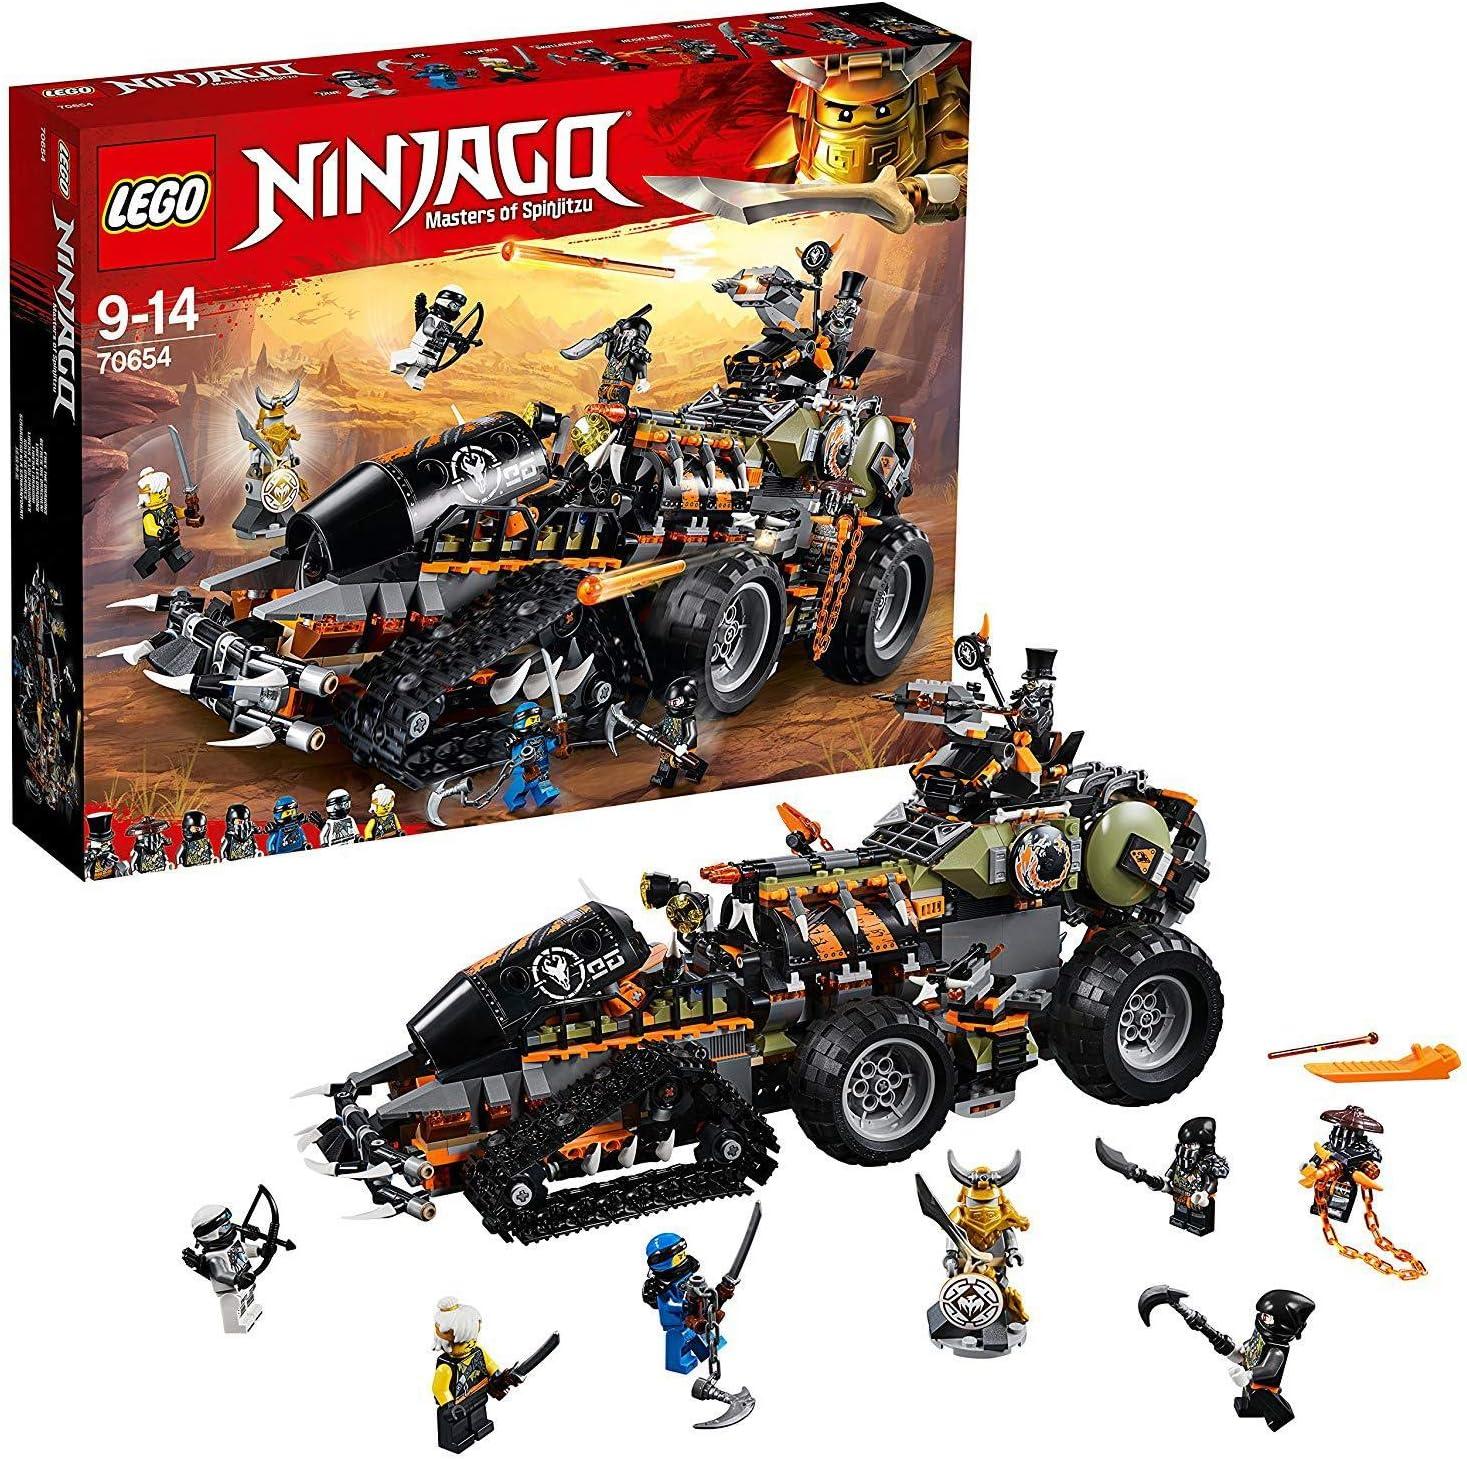 LEGO Ninjago Dragon Hunters Dieselnaut Toy Tank, Ninja Warriors Vehicle Building Sets for Kids